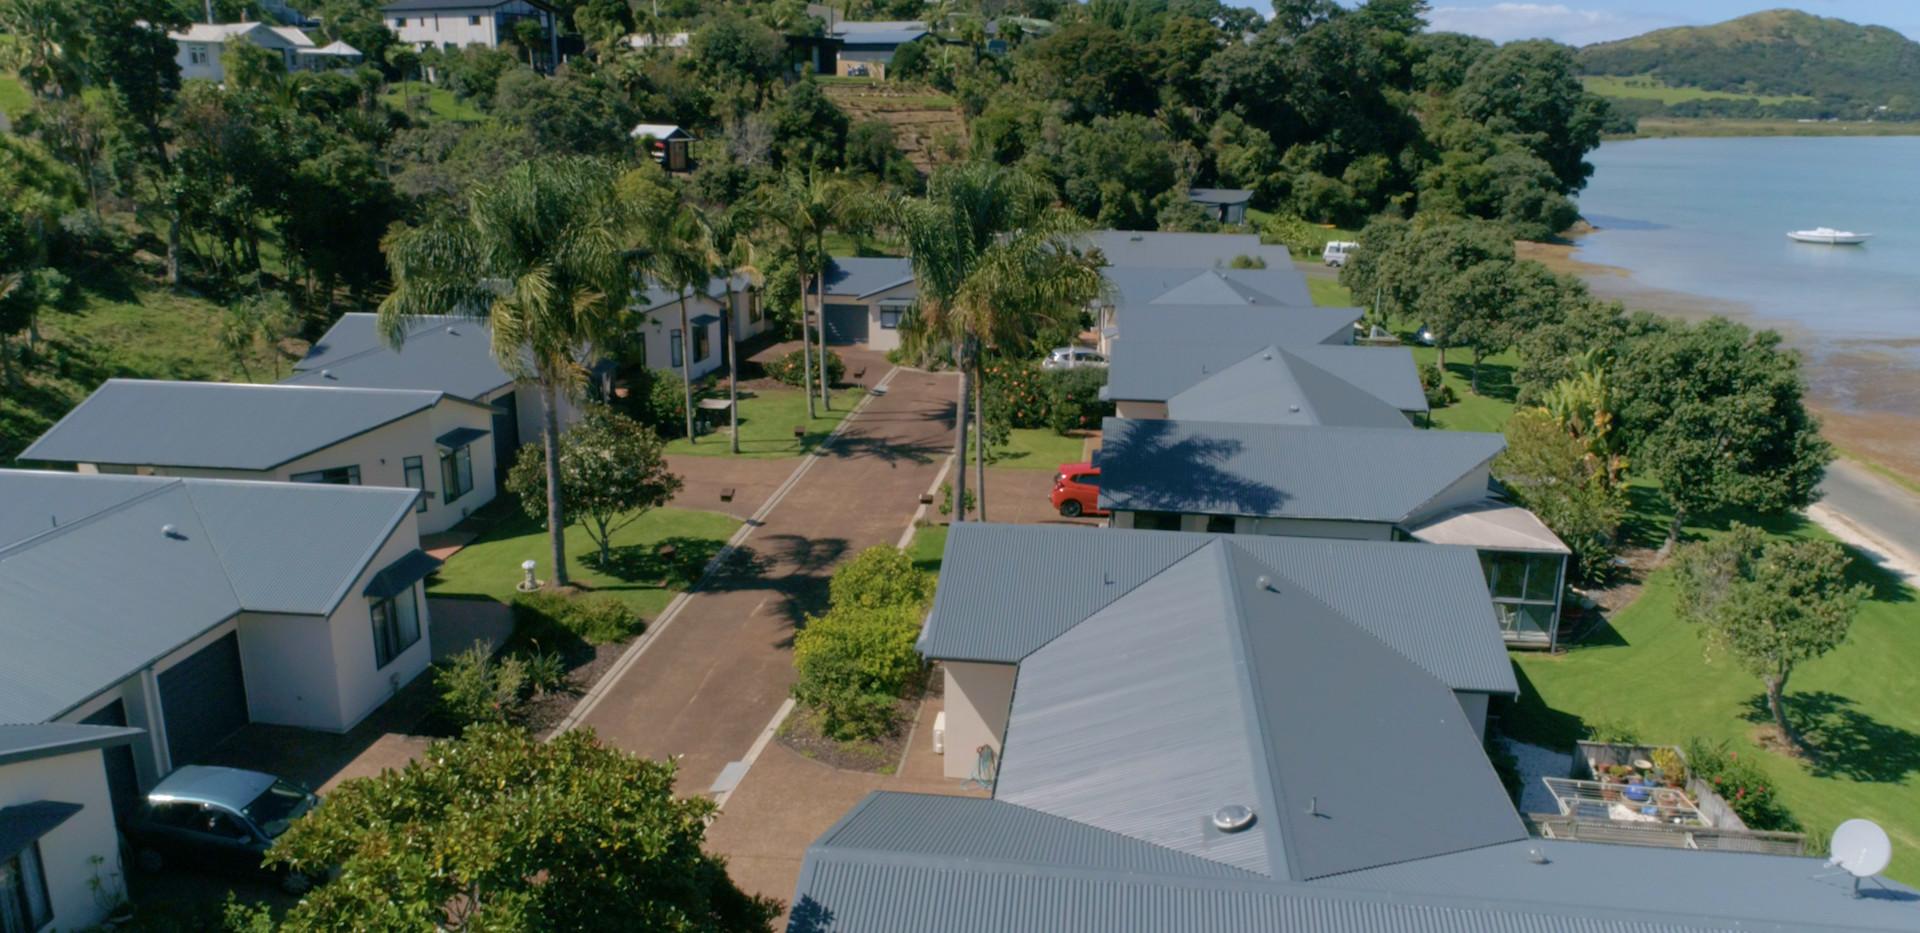 Villas & Grounds Waiheke Retirement Village